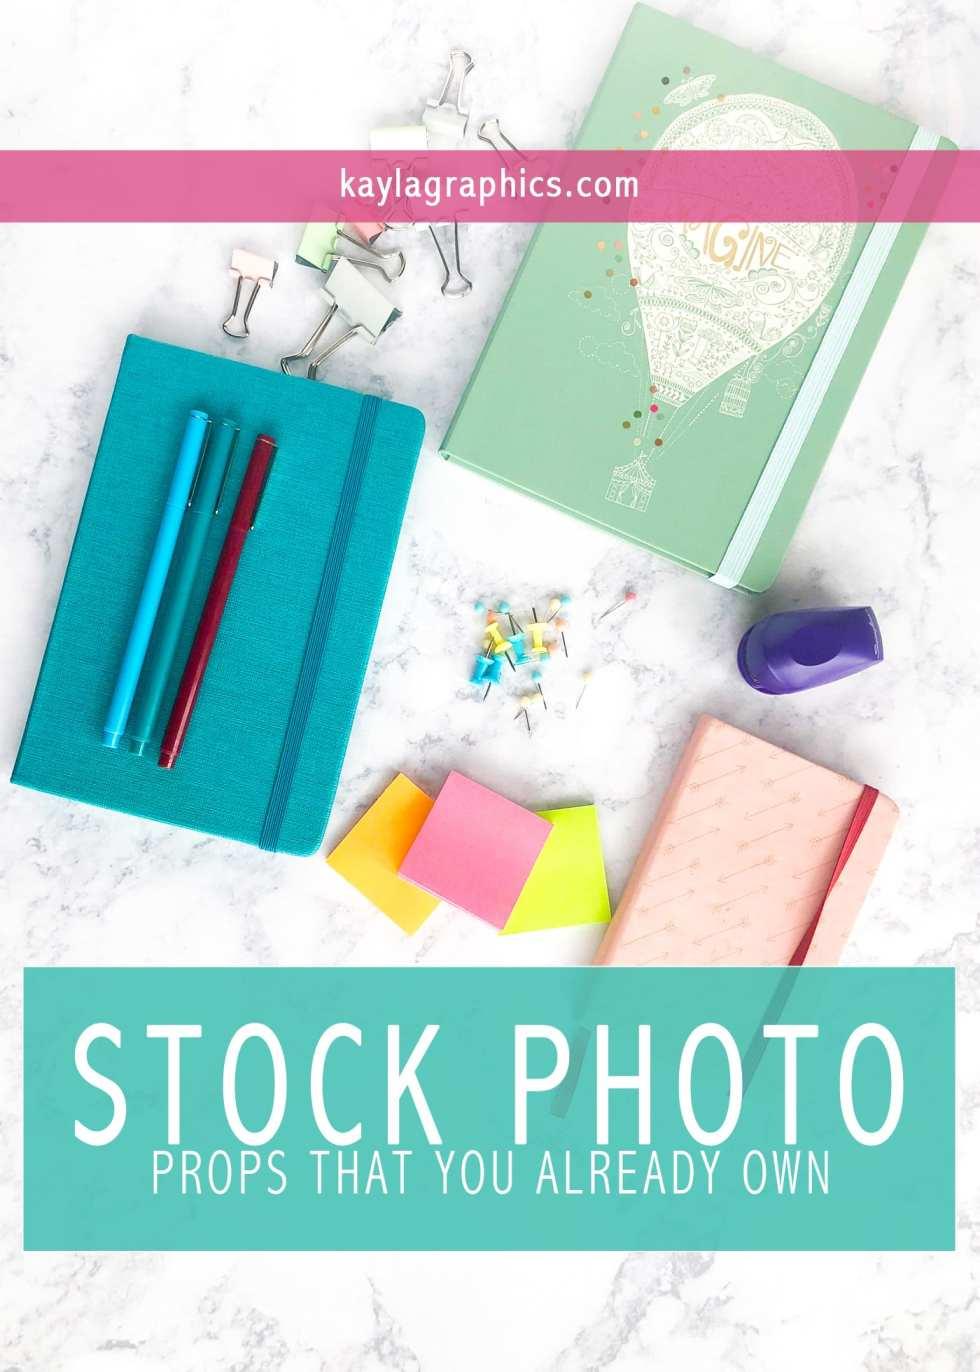 Stock Photo Props You Already Own